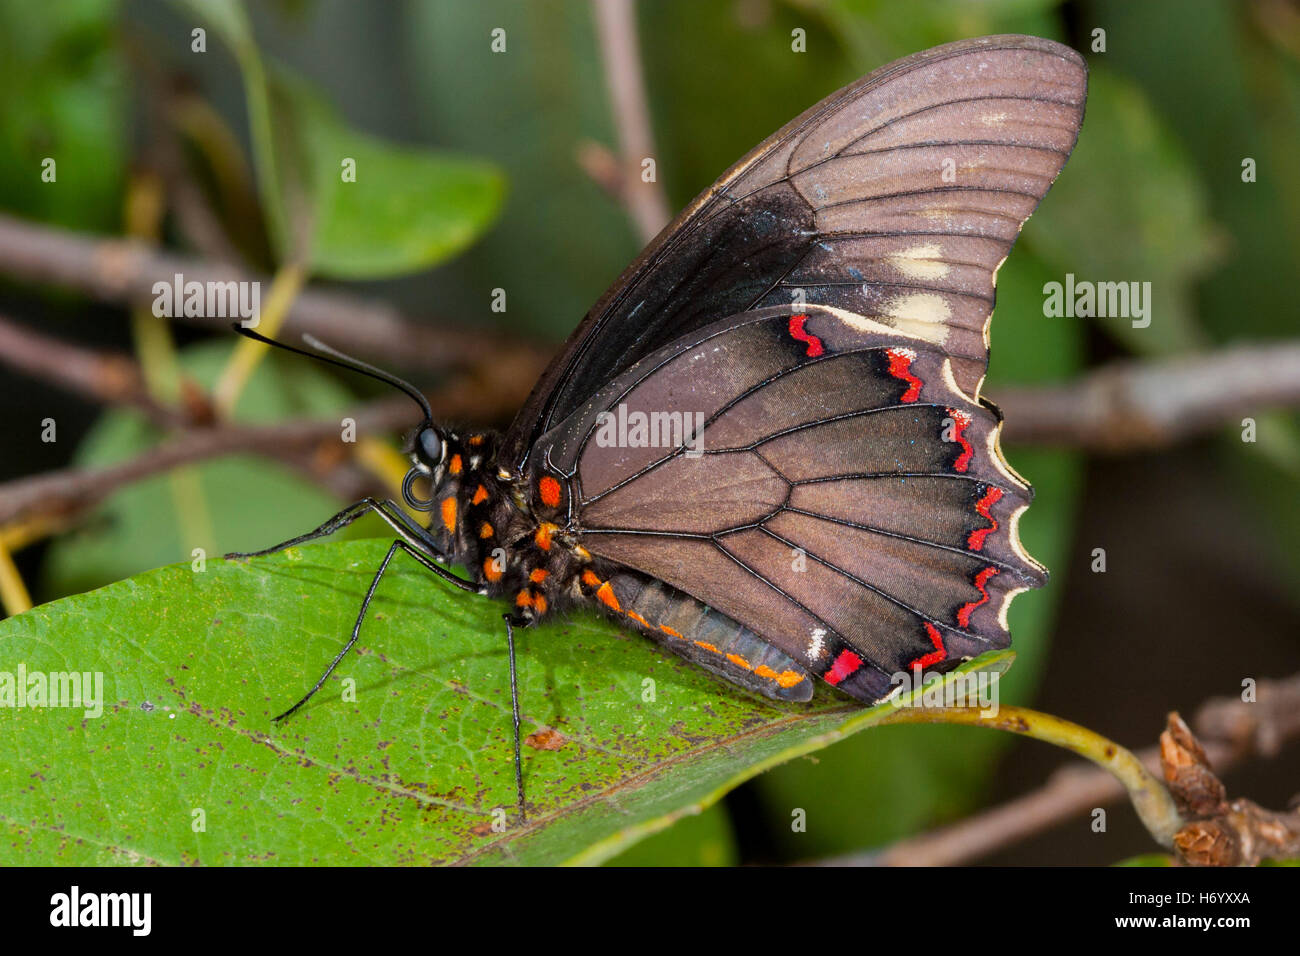 A coda di rondine Polydamas Battus polydamas Gomez Farias, Messico 26 gennaio 2004 Papilionidae adulto Papilioninae Immagini Stock